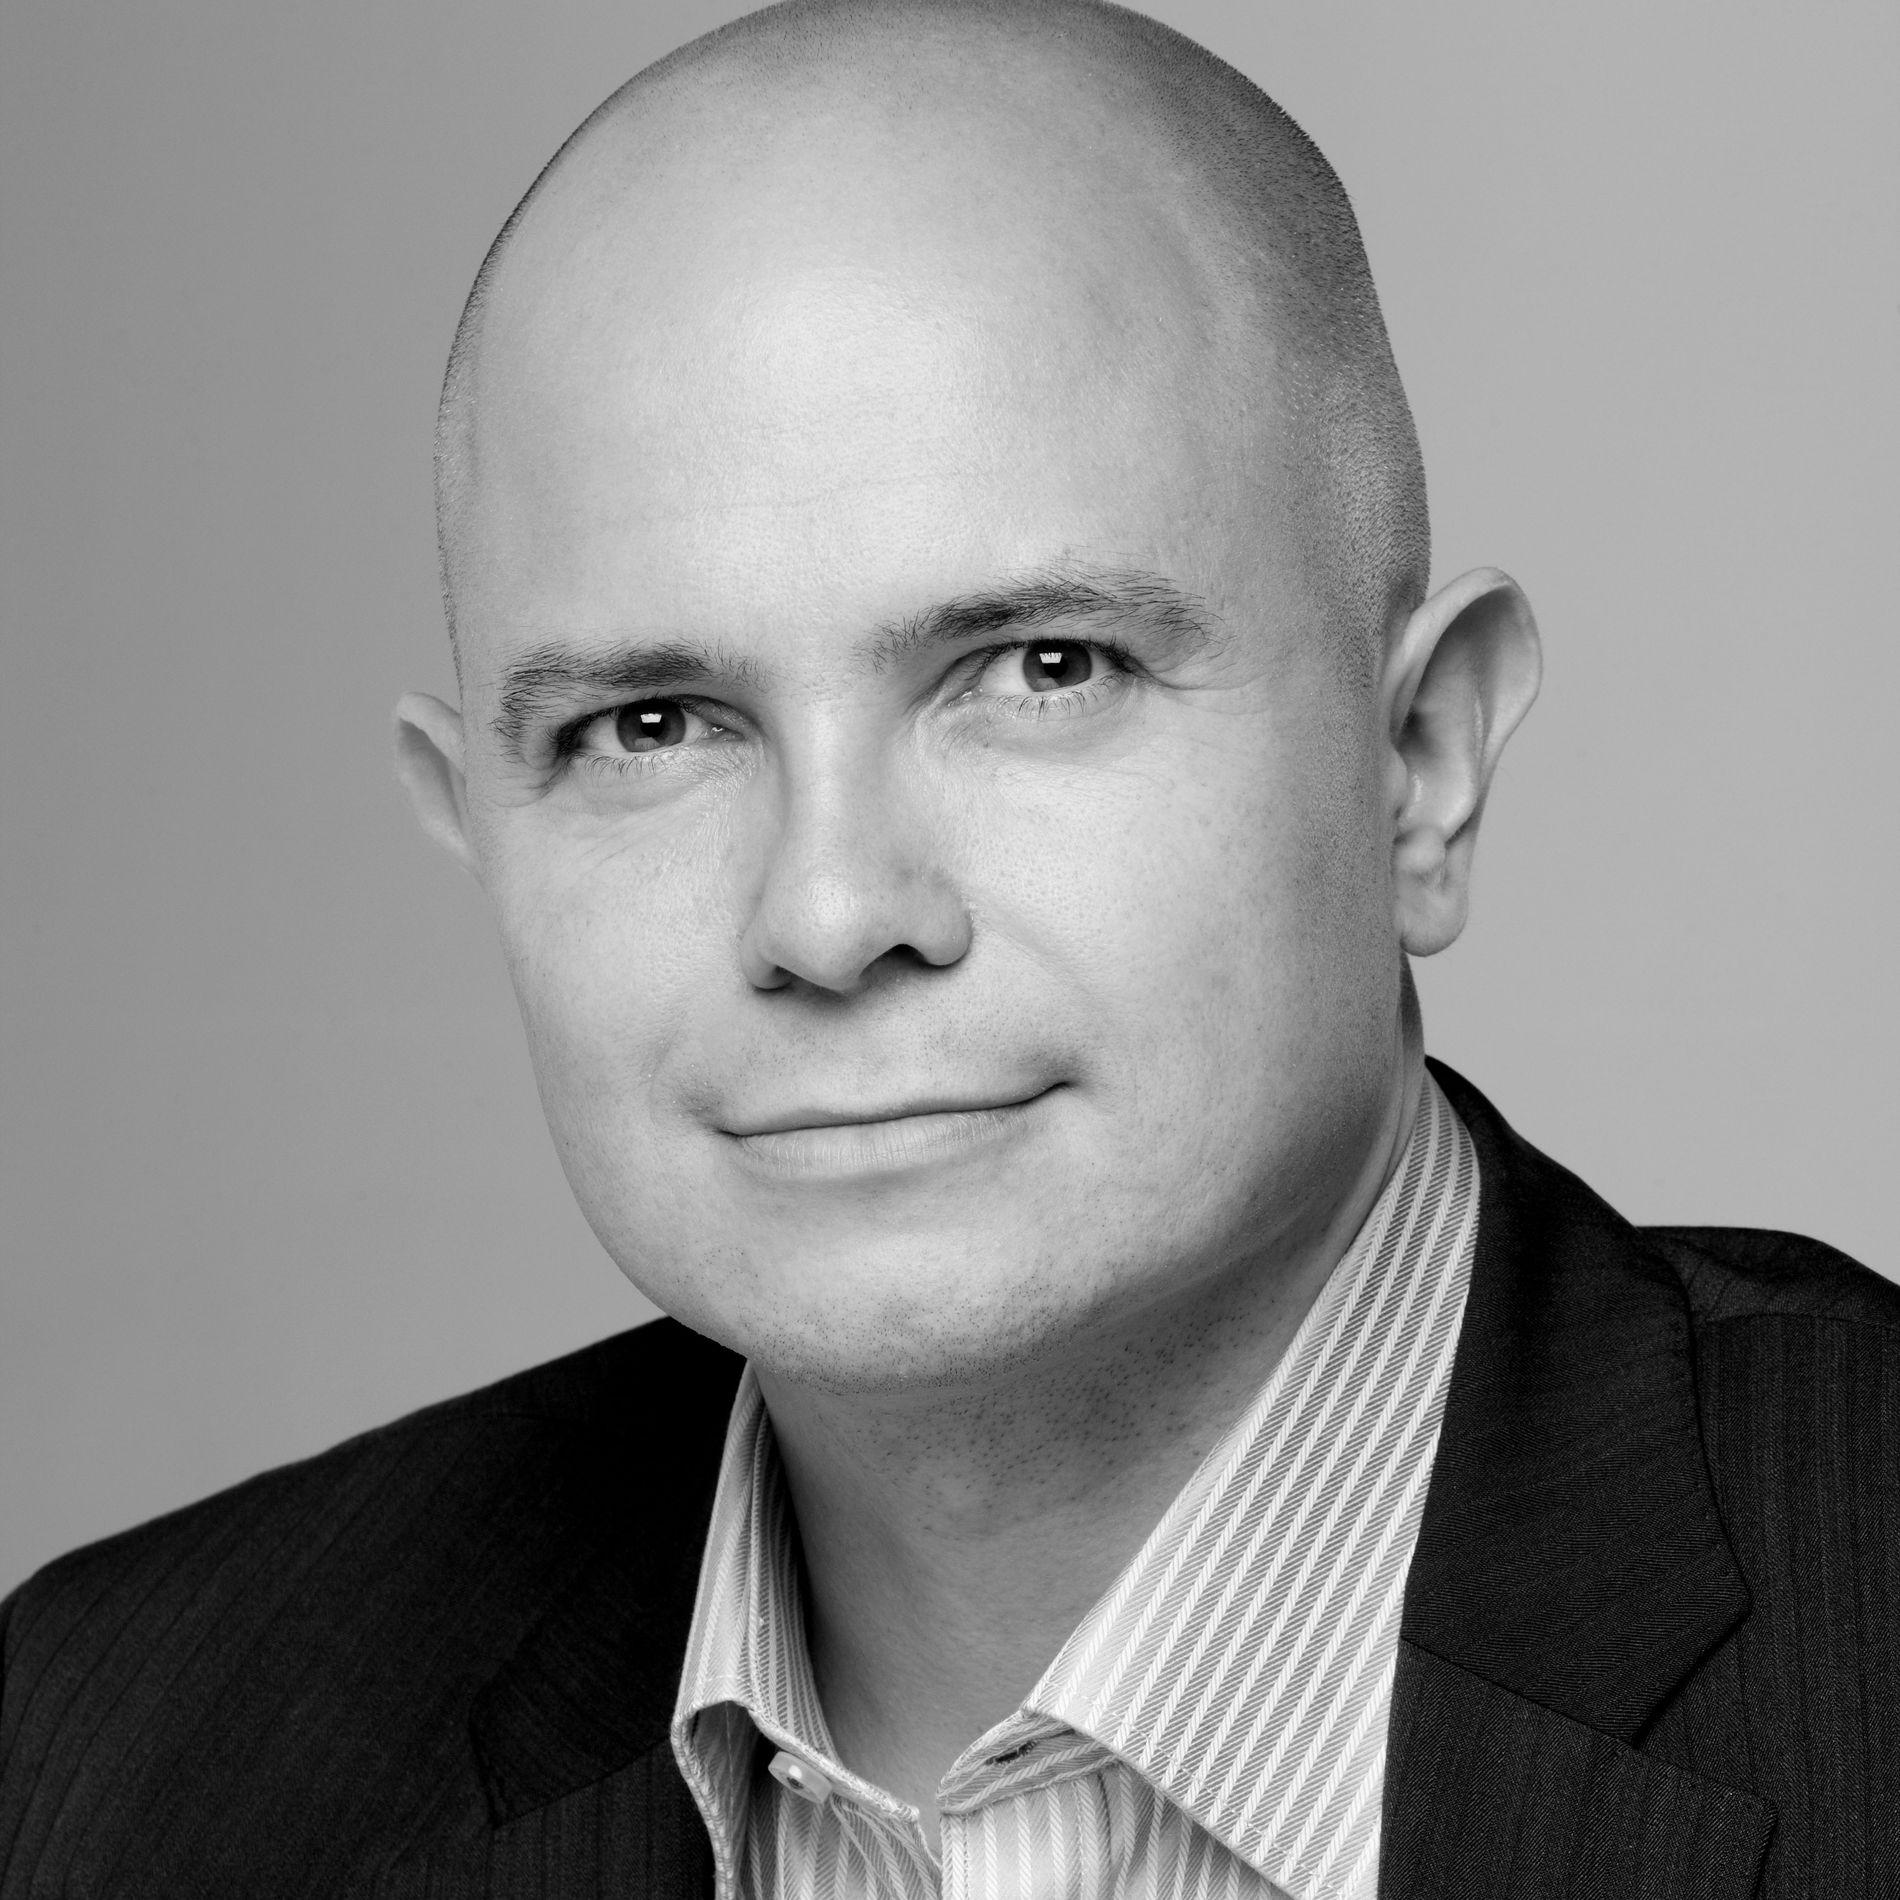 Ole Jørgen Torvmark